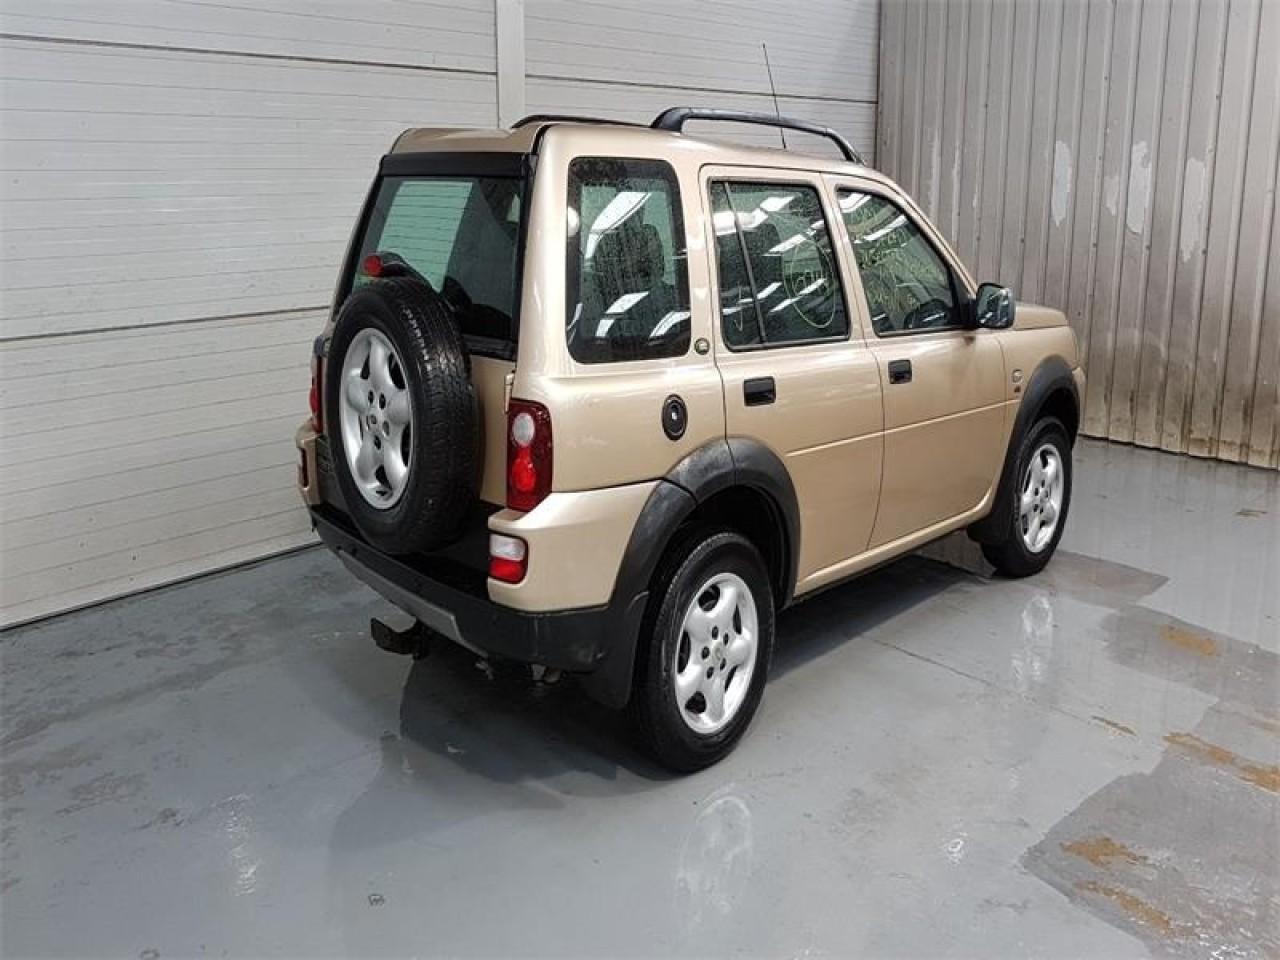 Ceasuri bord Land Rover Freelander 2005 SUV 2.0 D